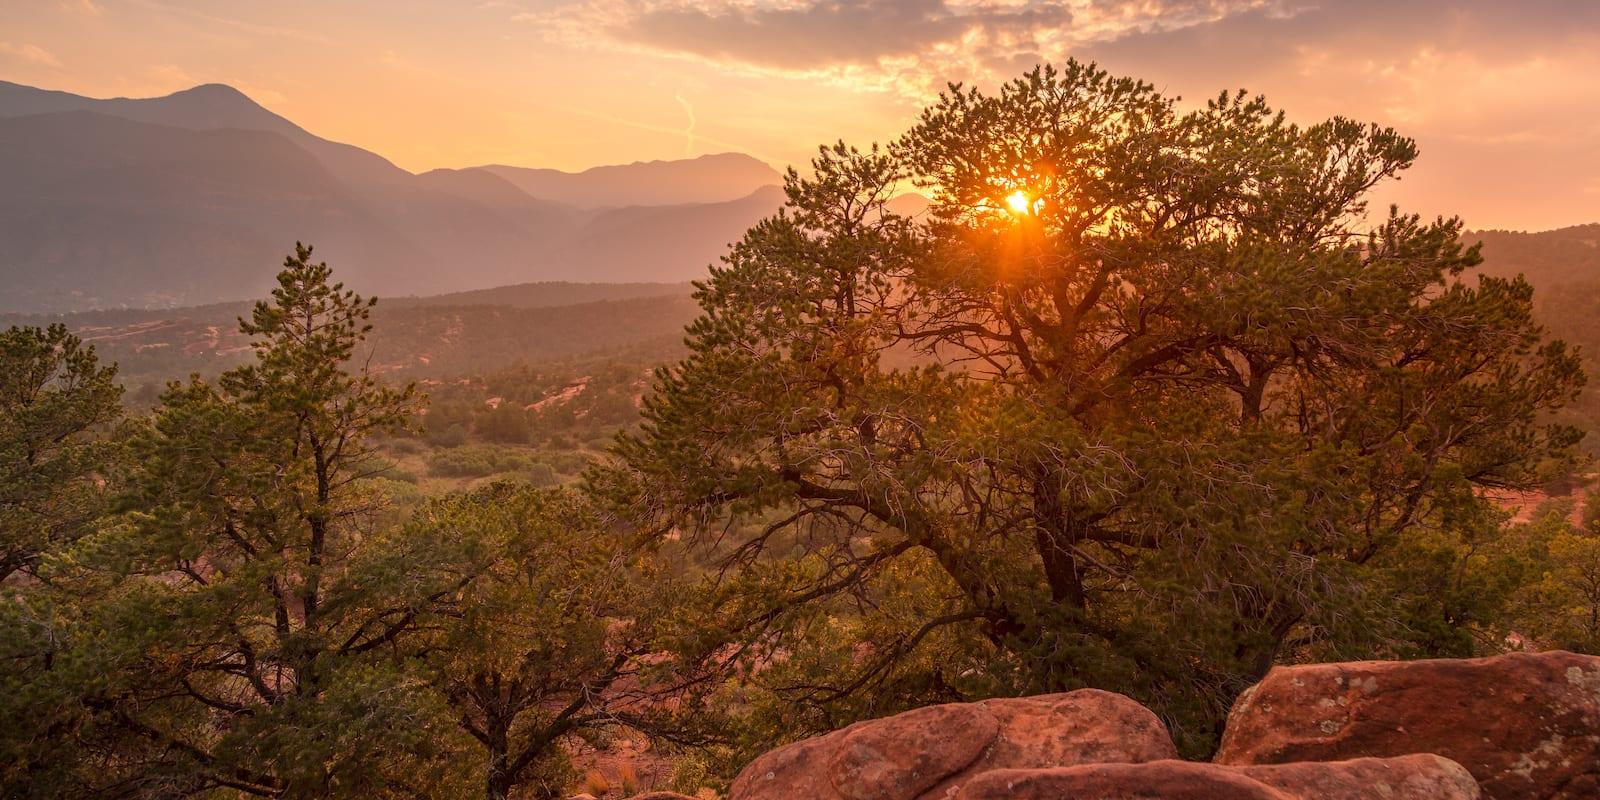 Pikes Peak Sunset Colorado Front Range